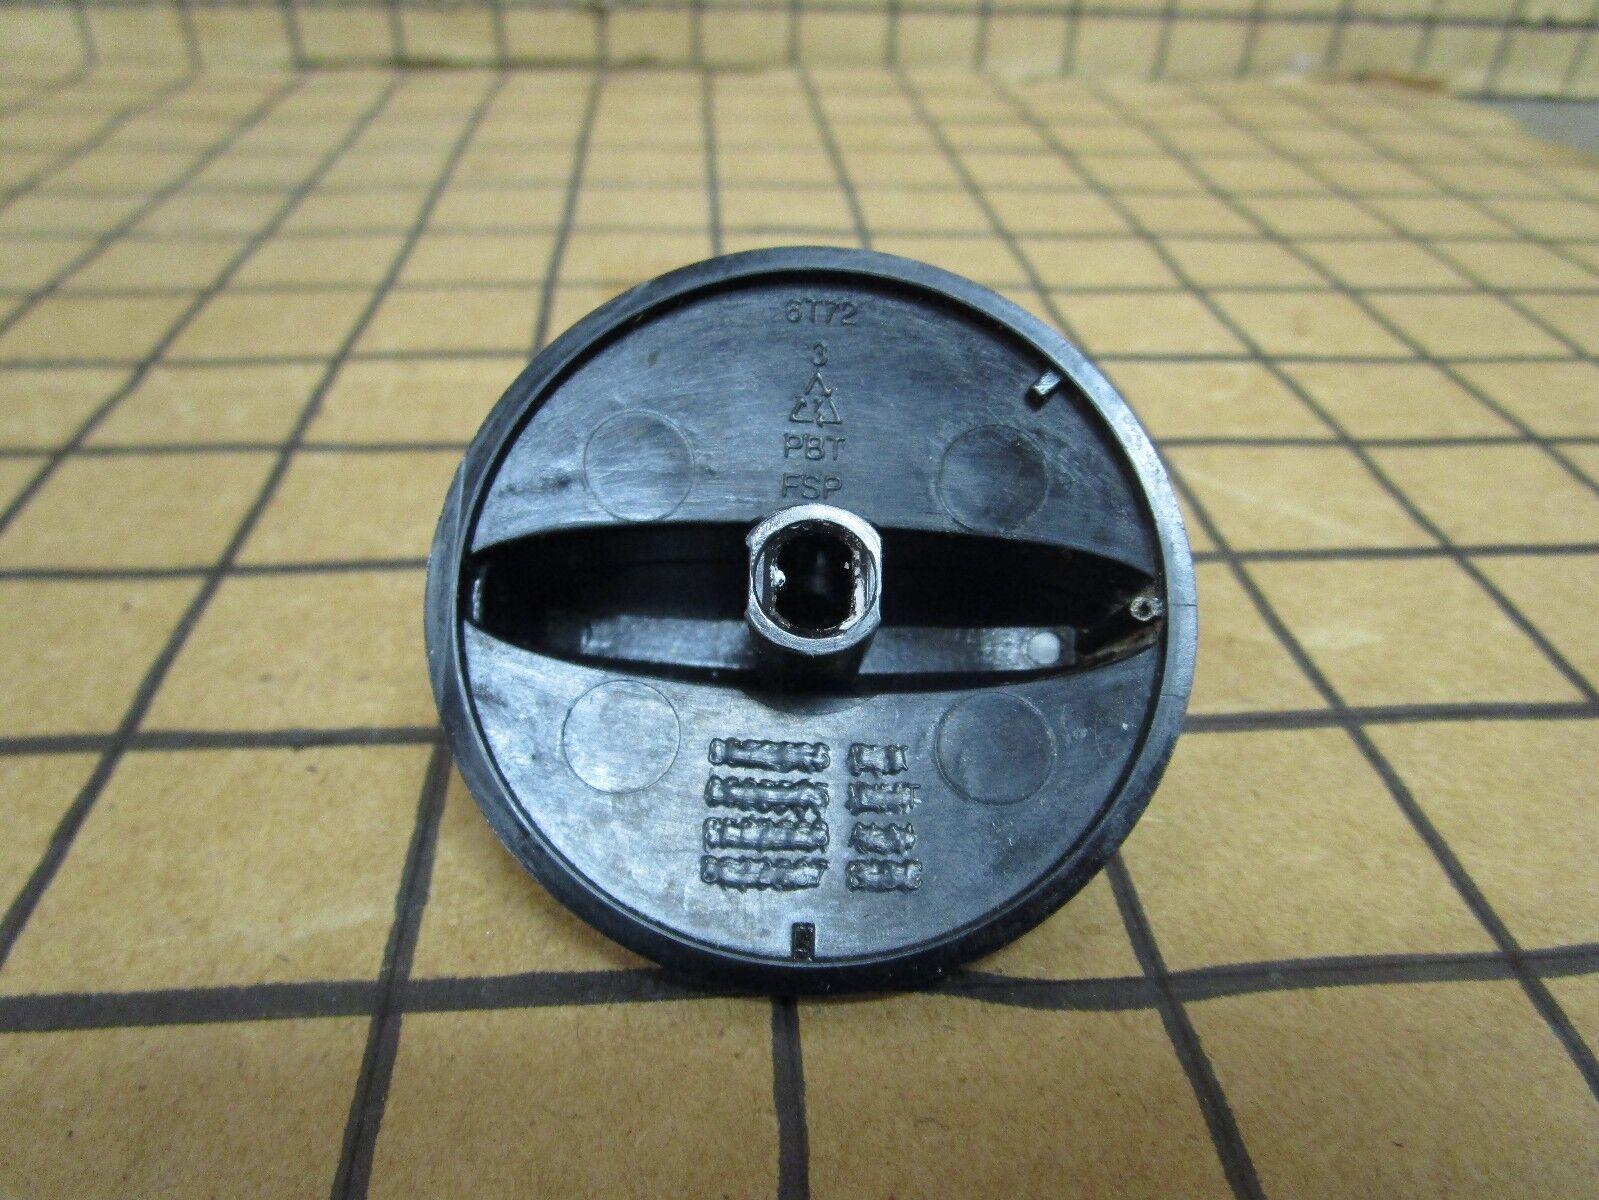 9761964 Whirlpool Stove Oven Range Knob-Electricwplbl OEM 9761964